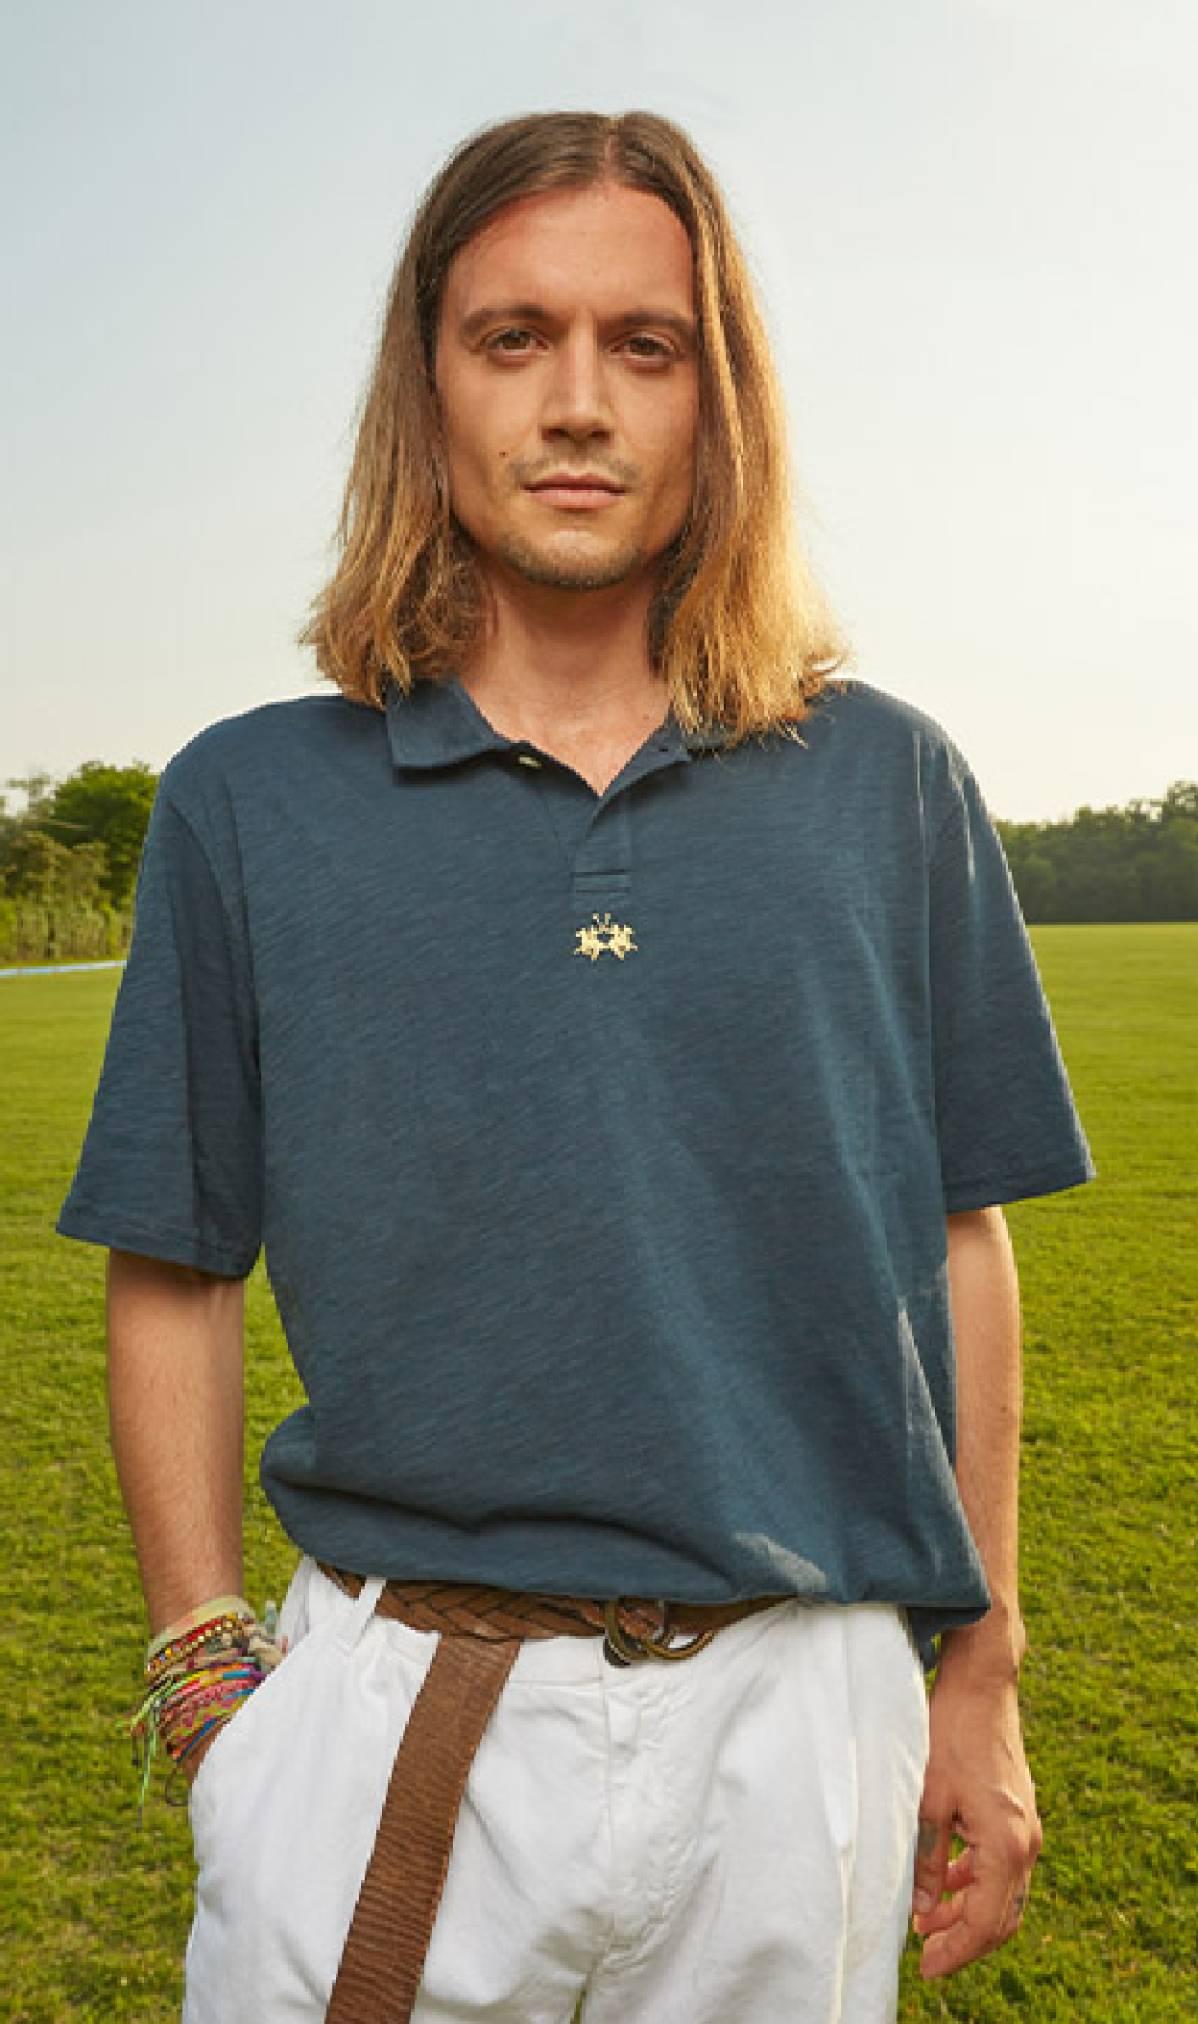 LA MARTINA Guards Polo Club Weiß Polohemd T-Shirt Größe 1 S 2 M 3 L 4 XL